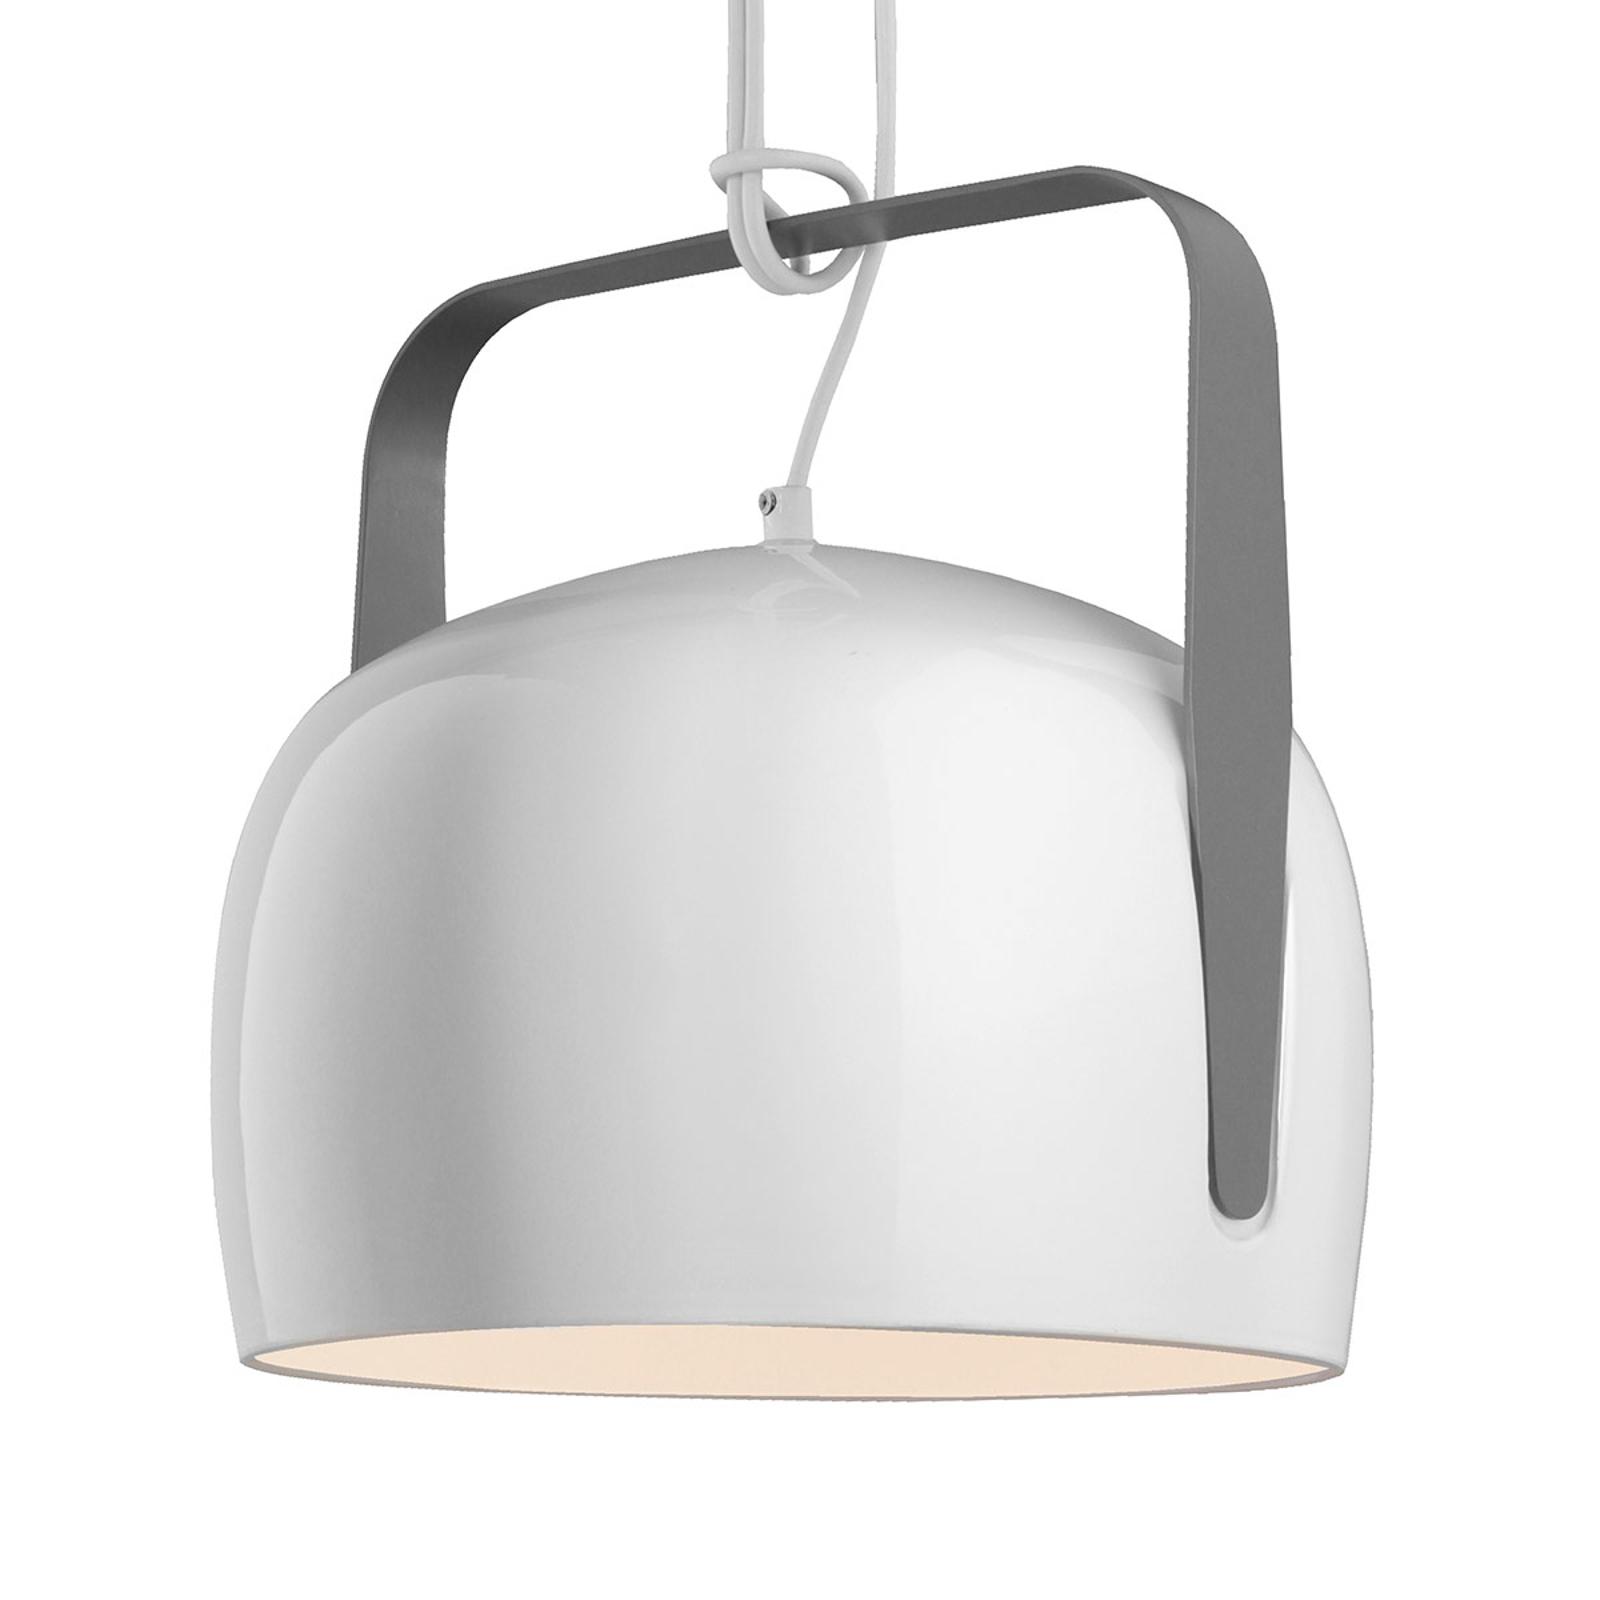 Karman Bag - biała lampa wisząca, Ø 32 cm, gładka